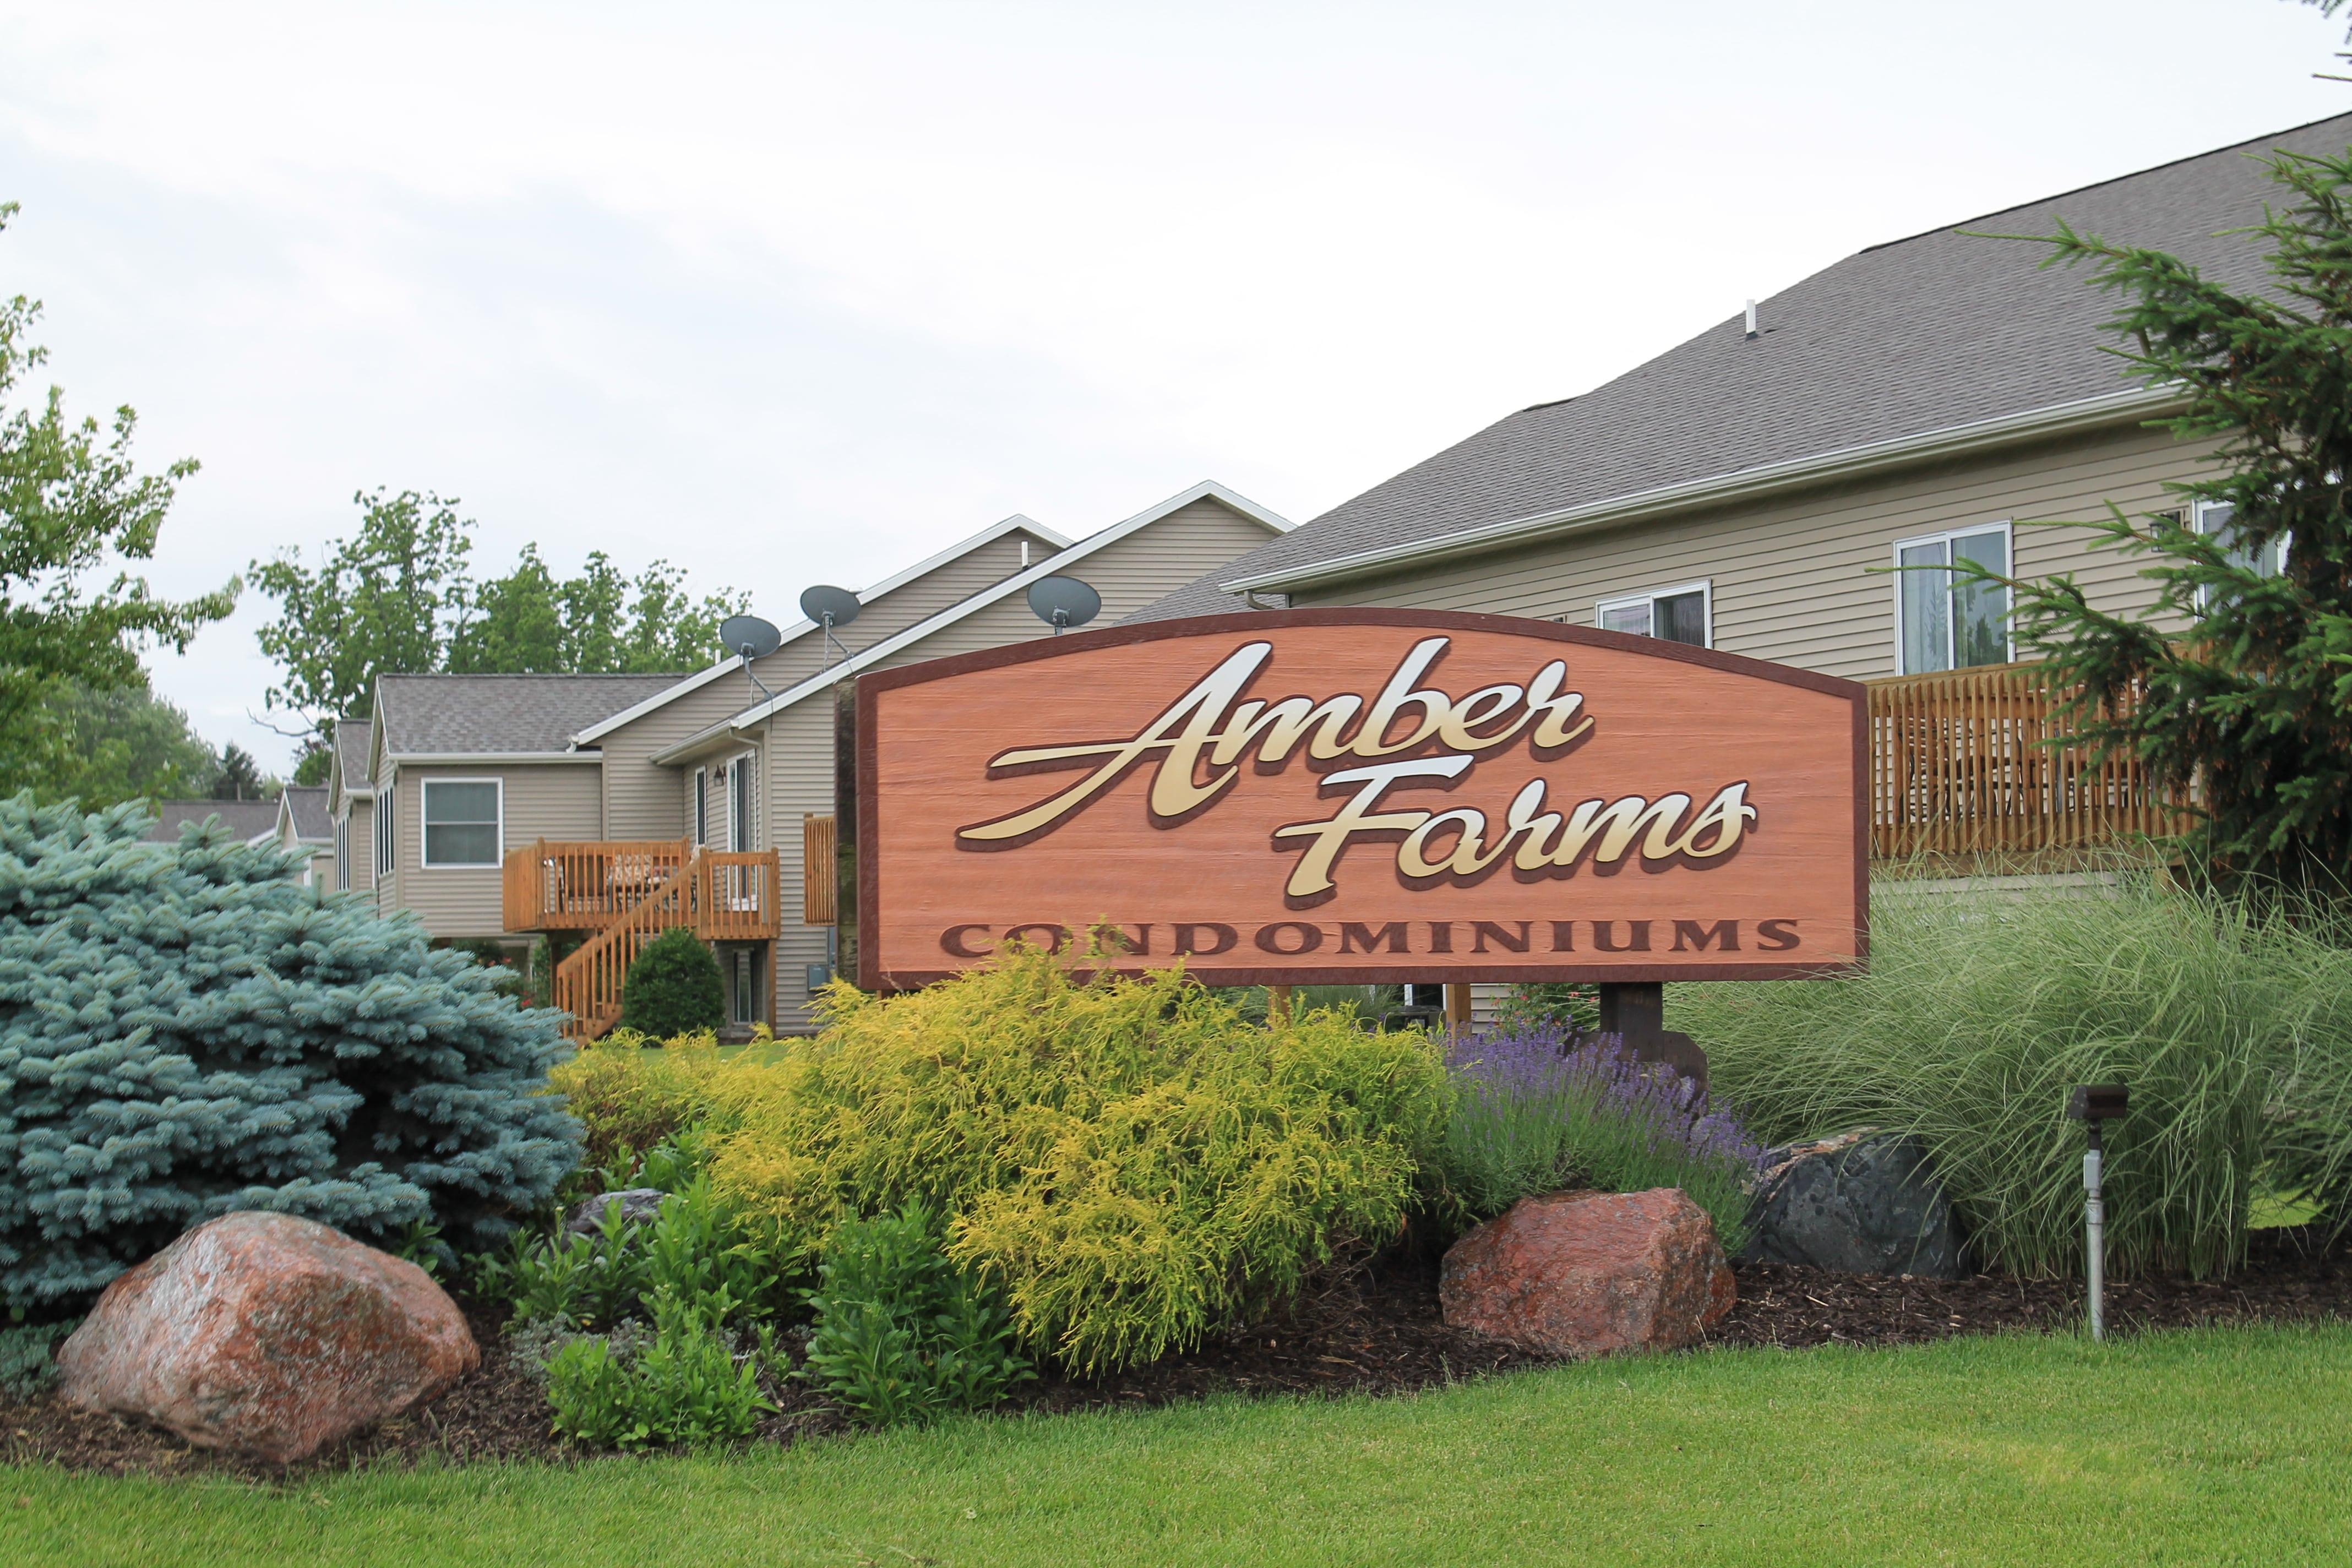 Entrance Sign at Amber Farms Condominiums